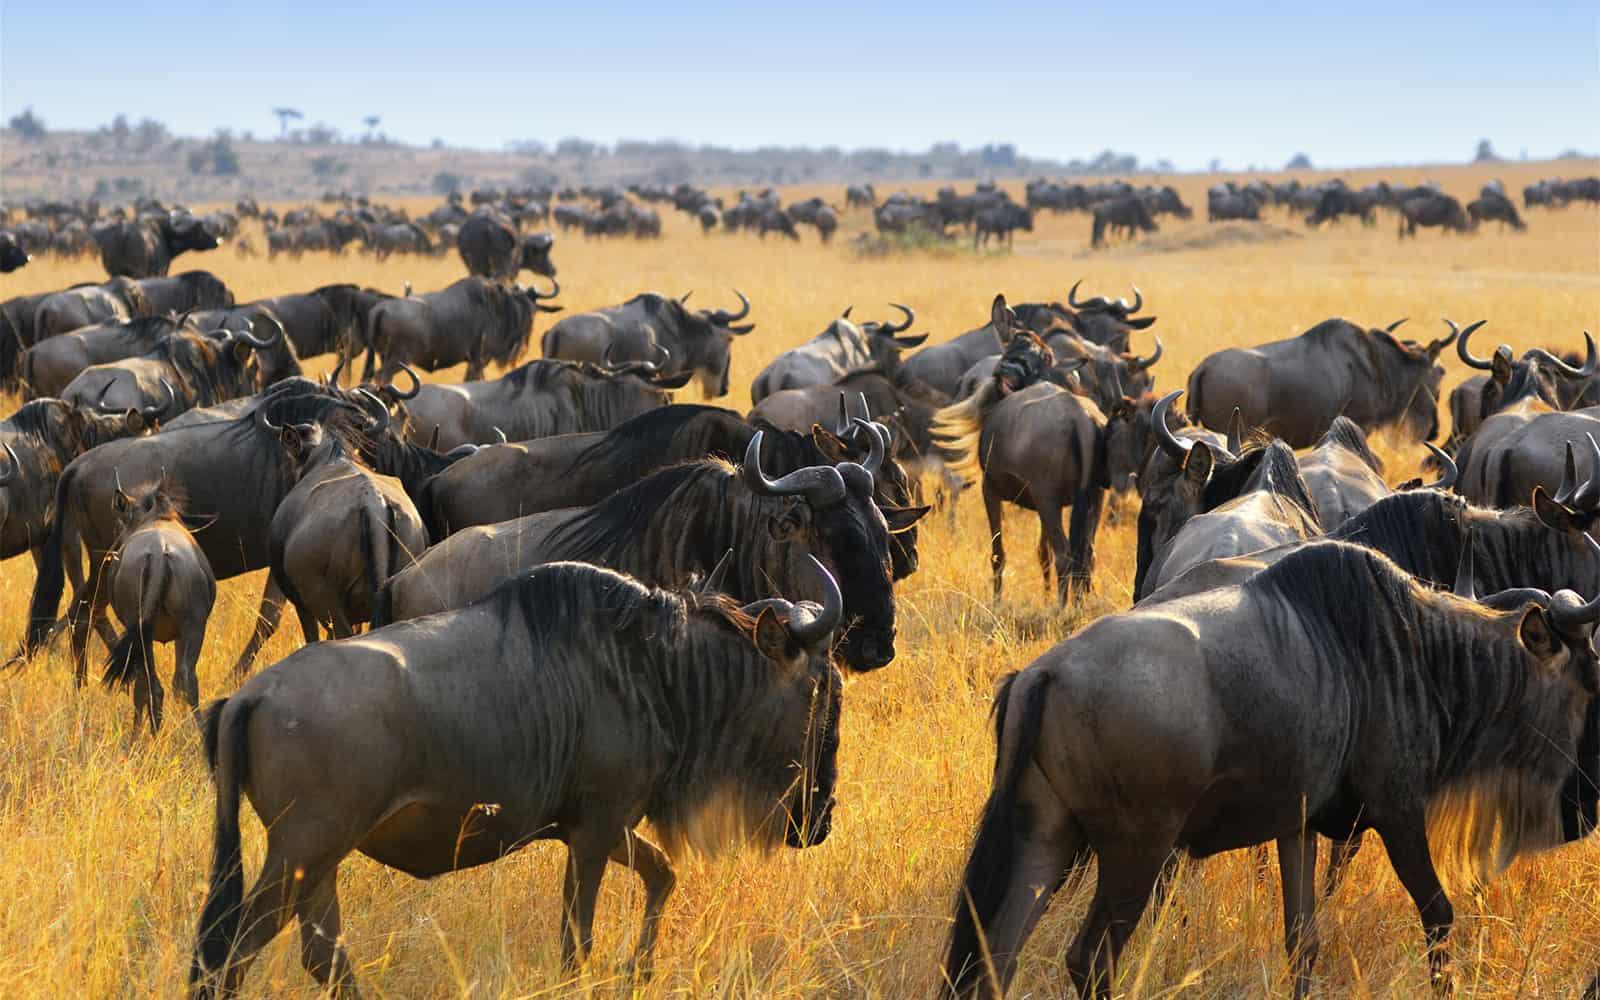 734829wildebeestmigrationkenyaeastafricaafrica